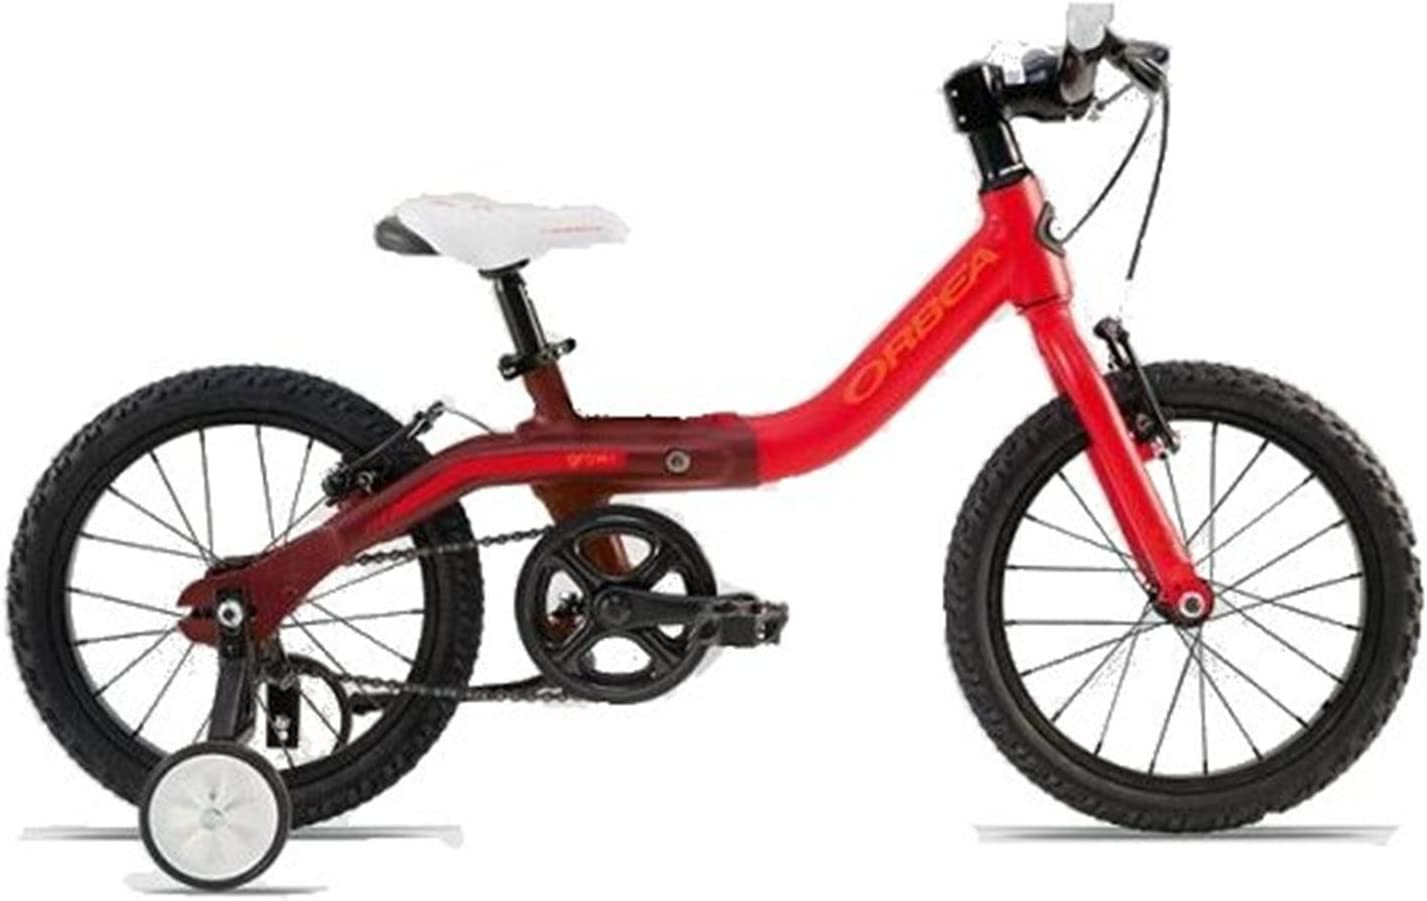 Orbea Grow 1 16 Rojo de mate 16 pulgadas 1 Gang bicicleta infantil ...